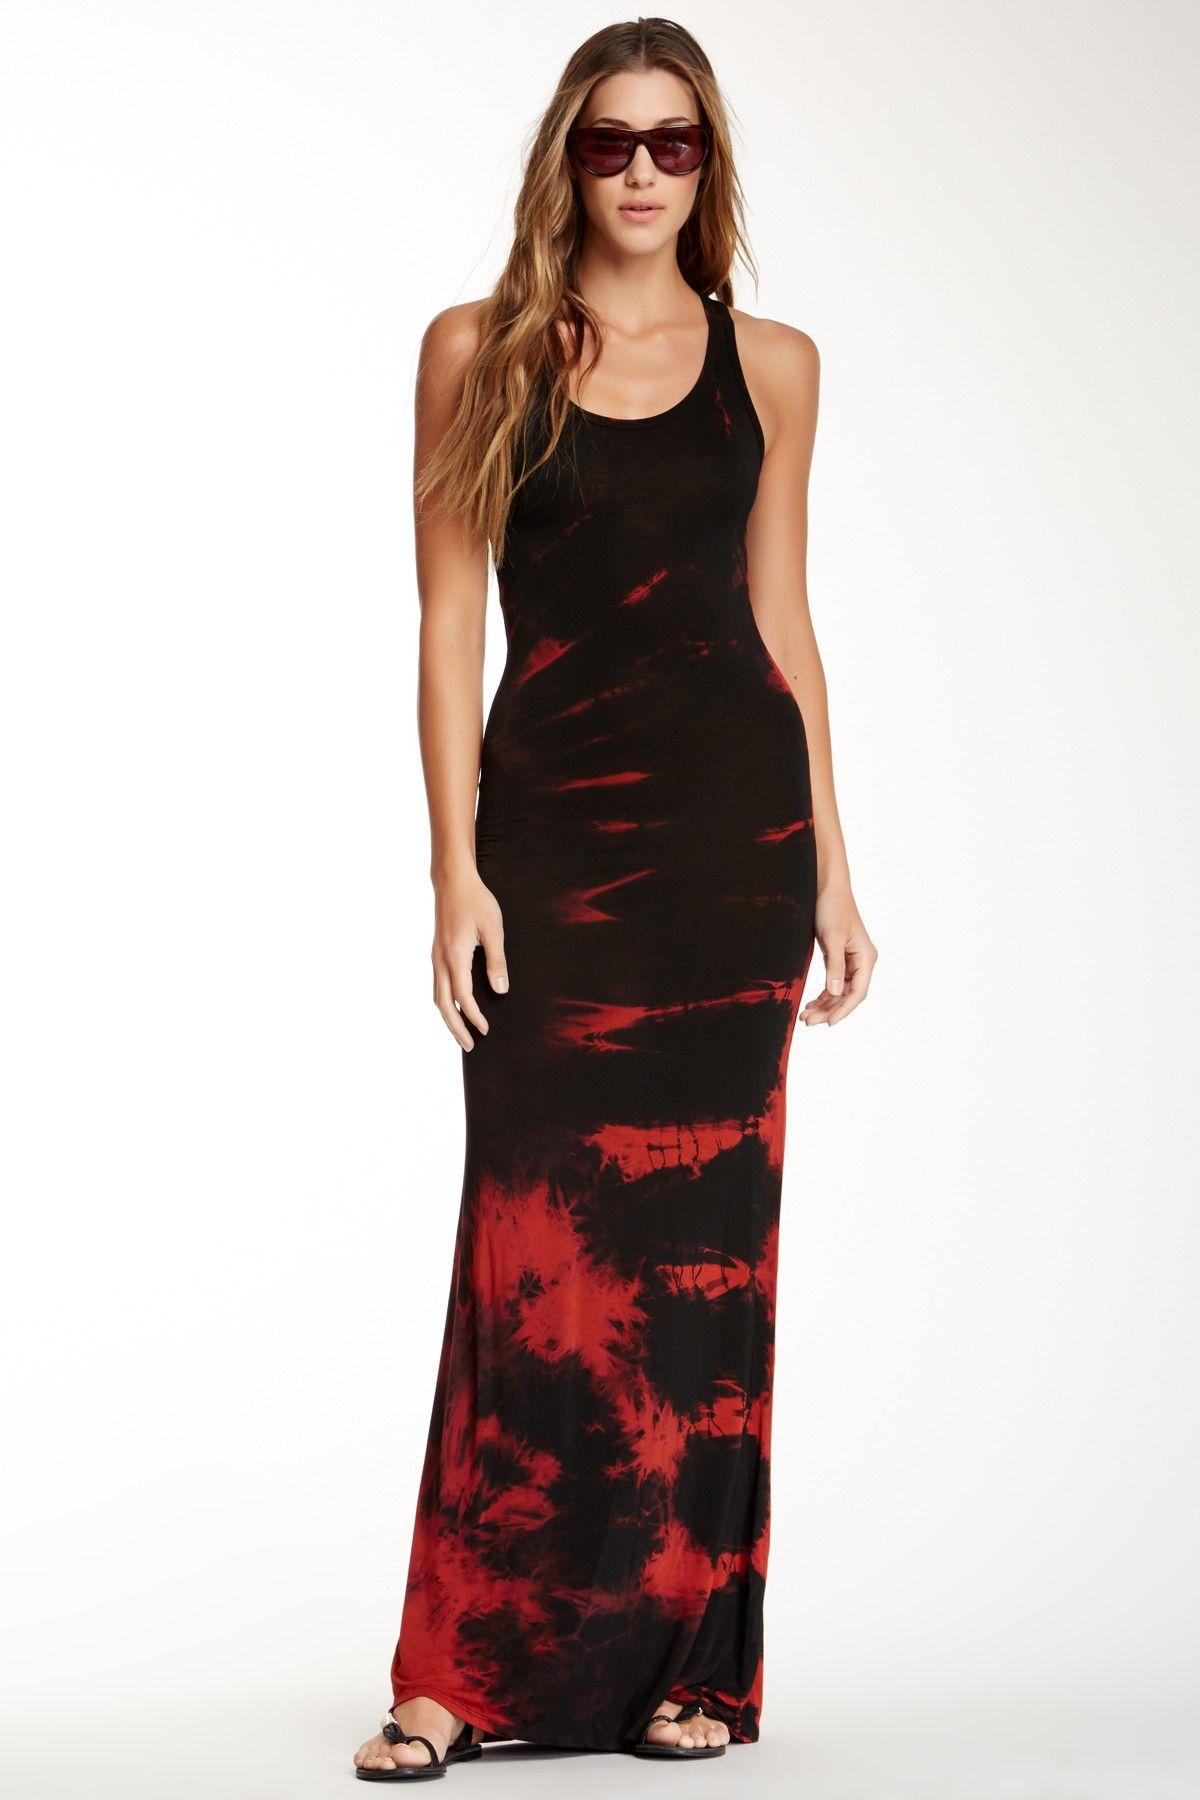 Go Couture | Go Couture Tie Dye Racerback Maxi Dress | Nordstrom Rack